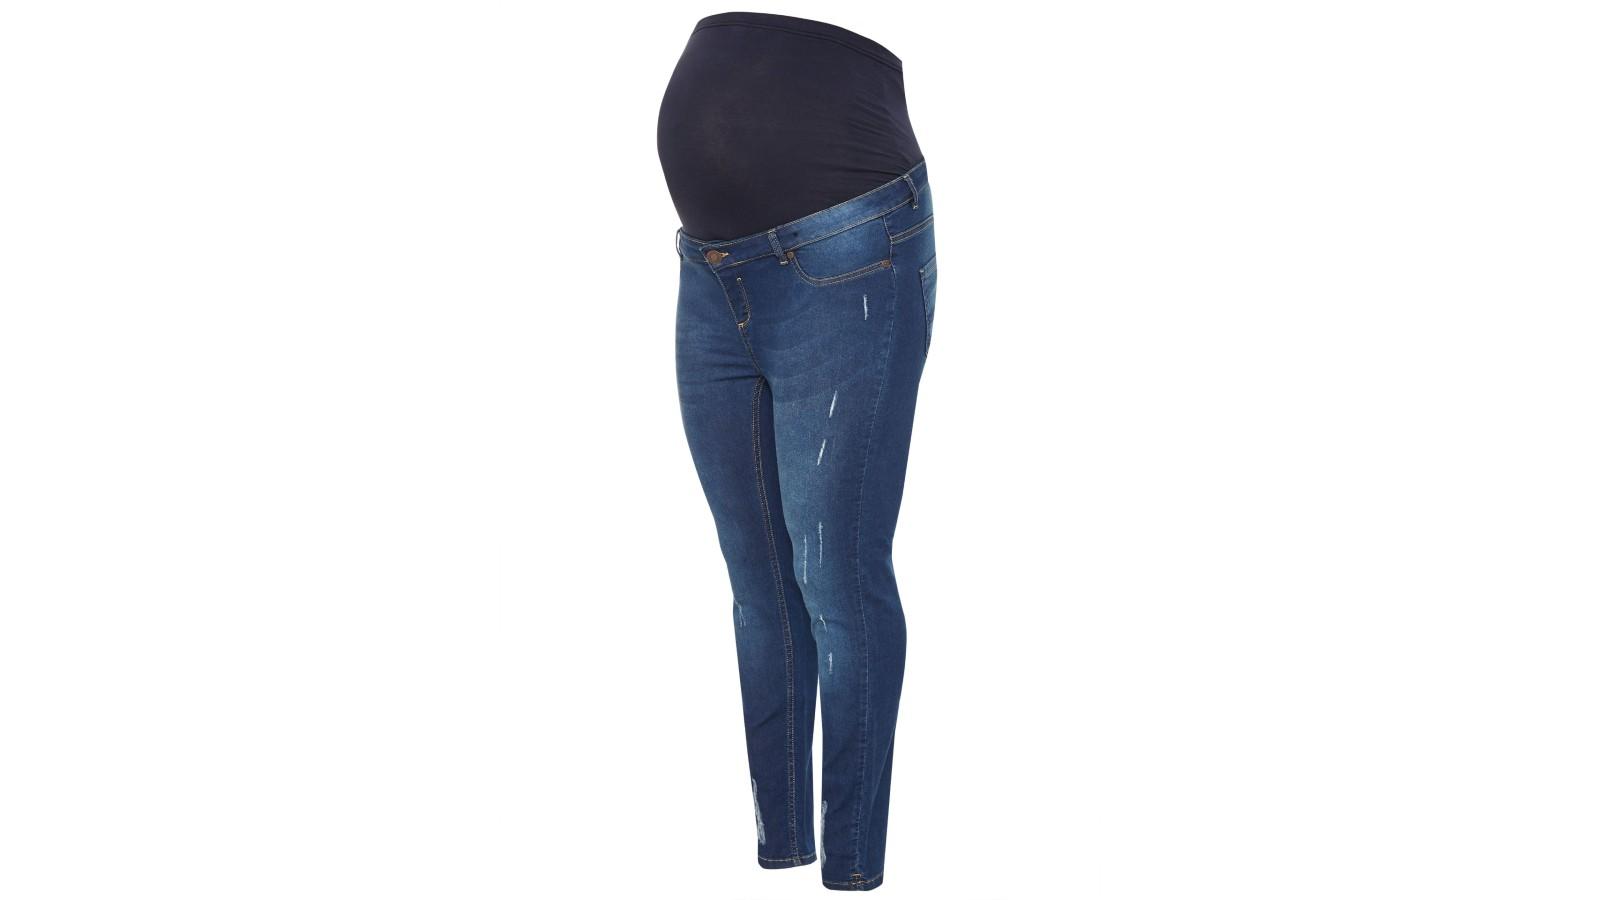 Le meilleur jean de grossesse grande taille - Yours Bump It Up Skinny Jeans